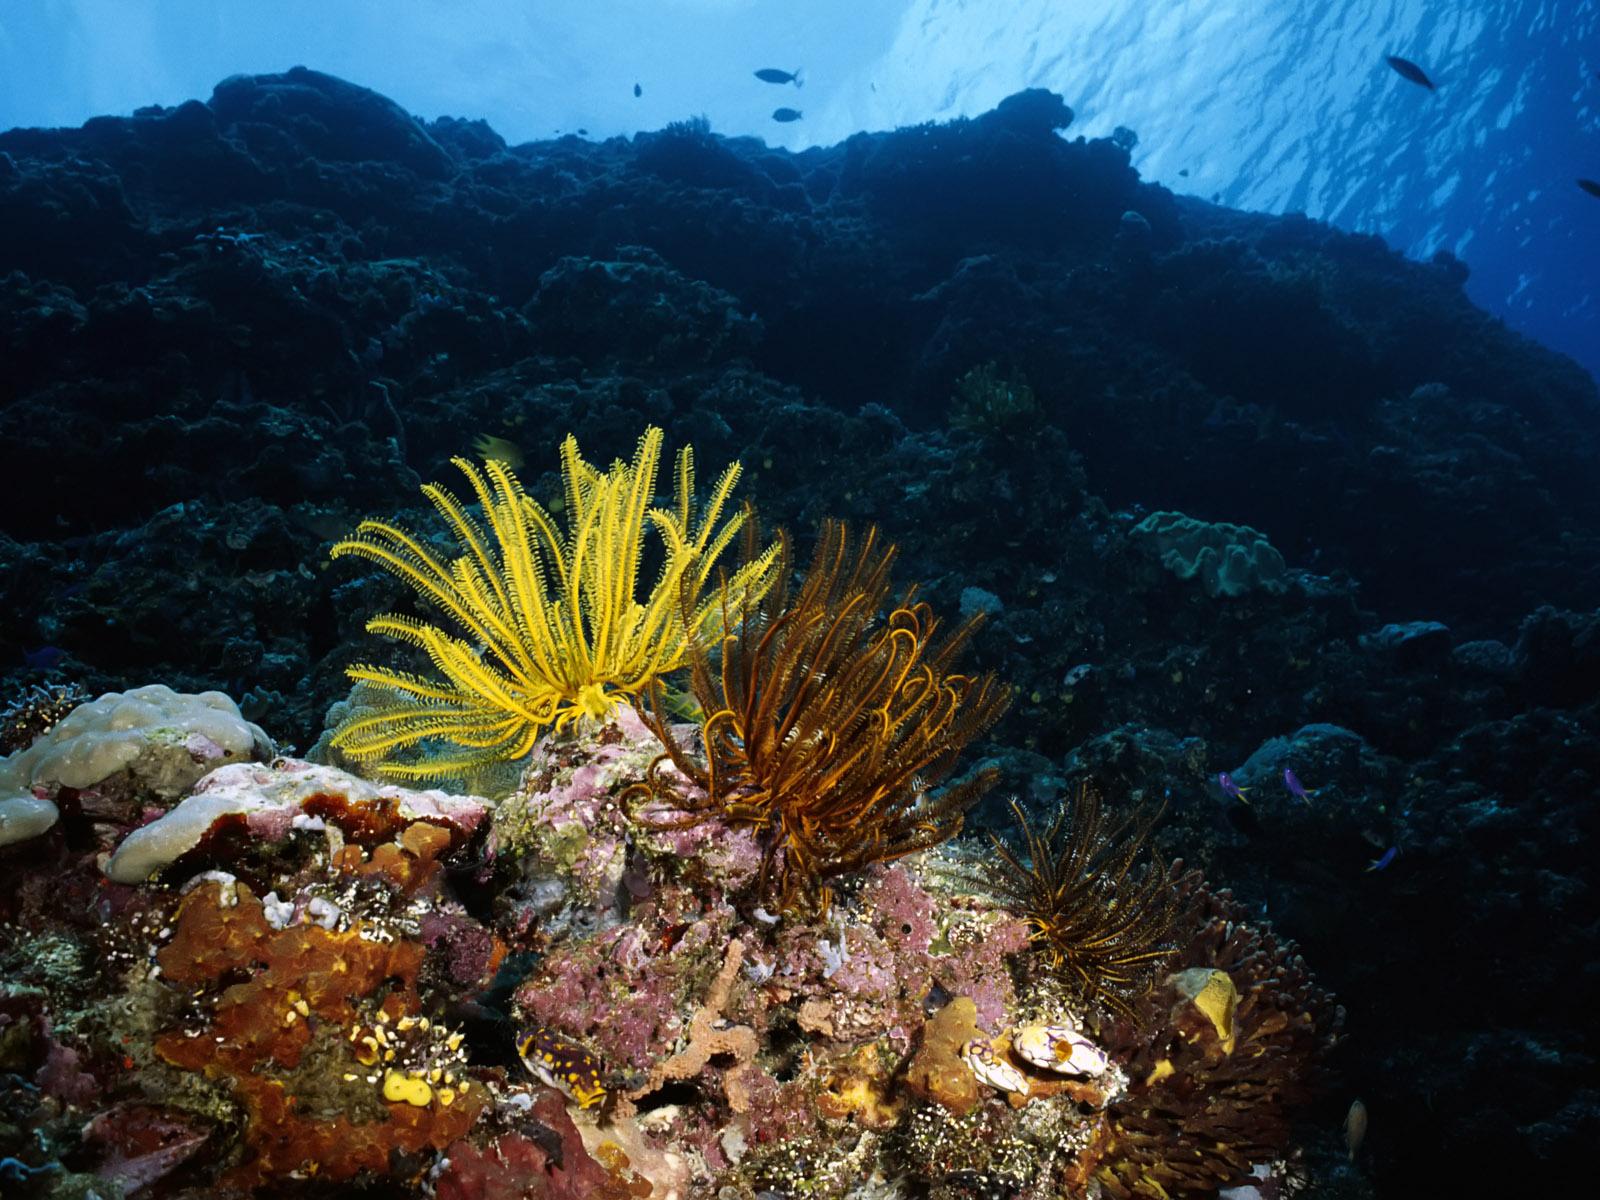 https://2.bp.blogspot.com/-2eVDZjiiotM/Tg4q4dakdMI/AAAAAAAABAs/nt3YytrwoDo/s1600/Underwater%2BWallpaper%2B%25252890%252529.jpg